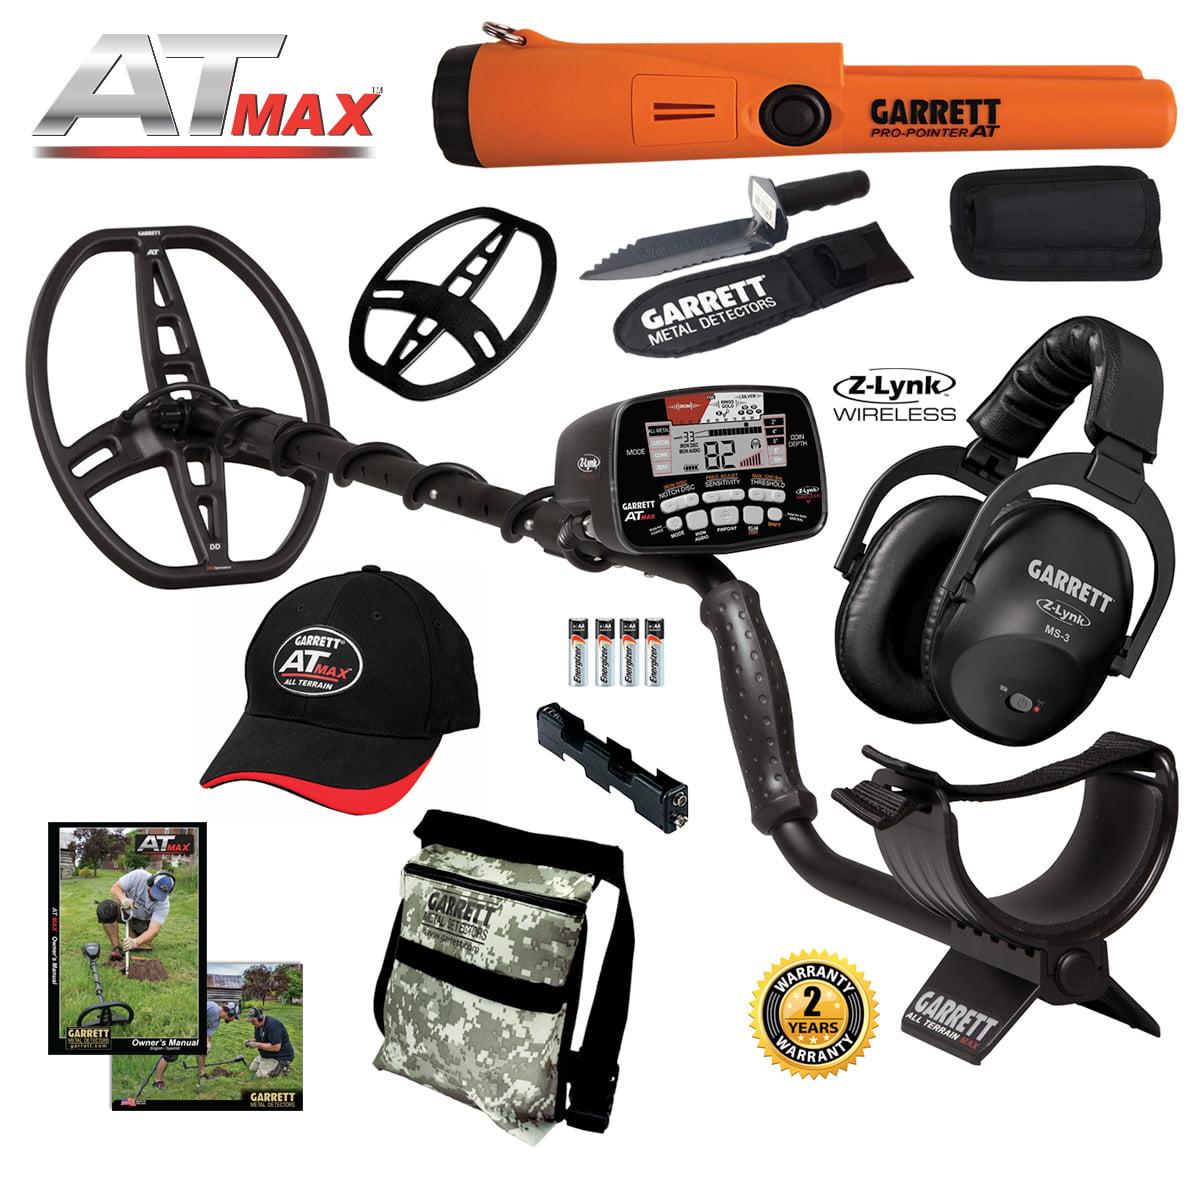 Garrett AT MAX Metal Detector, MS-3 Headphones, Pro-Pointer AT, Daypack & Digger by